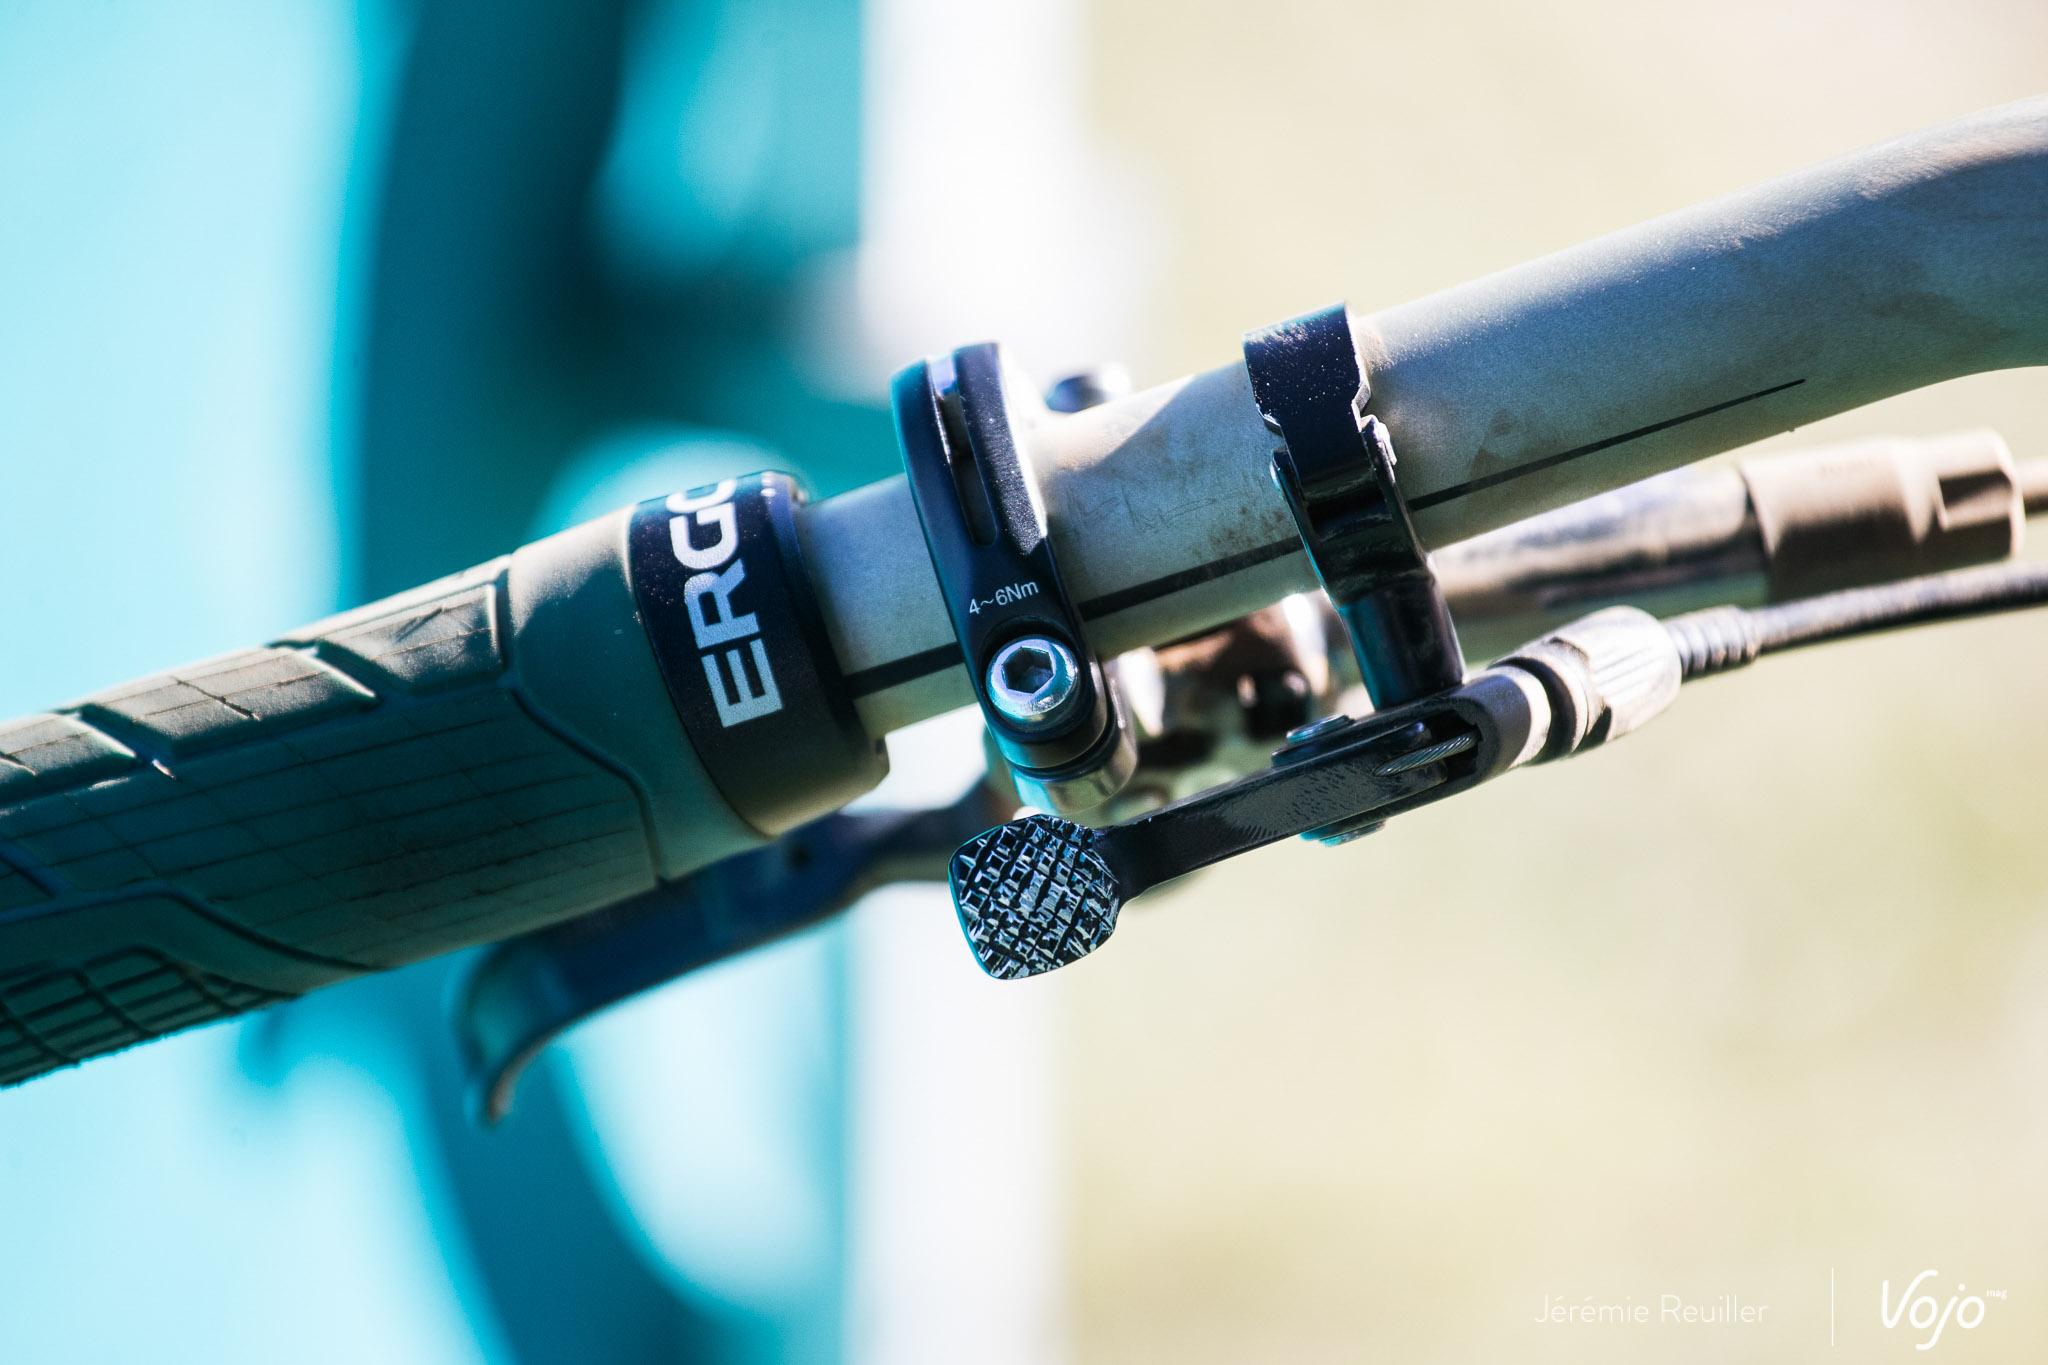 Bike_Check__Rude_Fox_EWS_1_Copyright_Reuiller_Vojomag-4